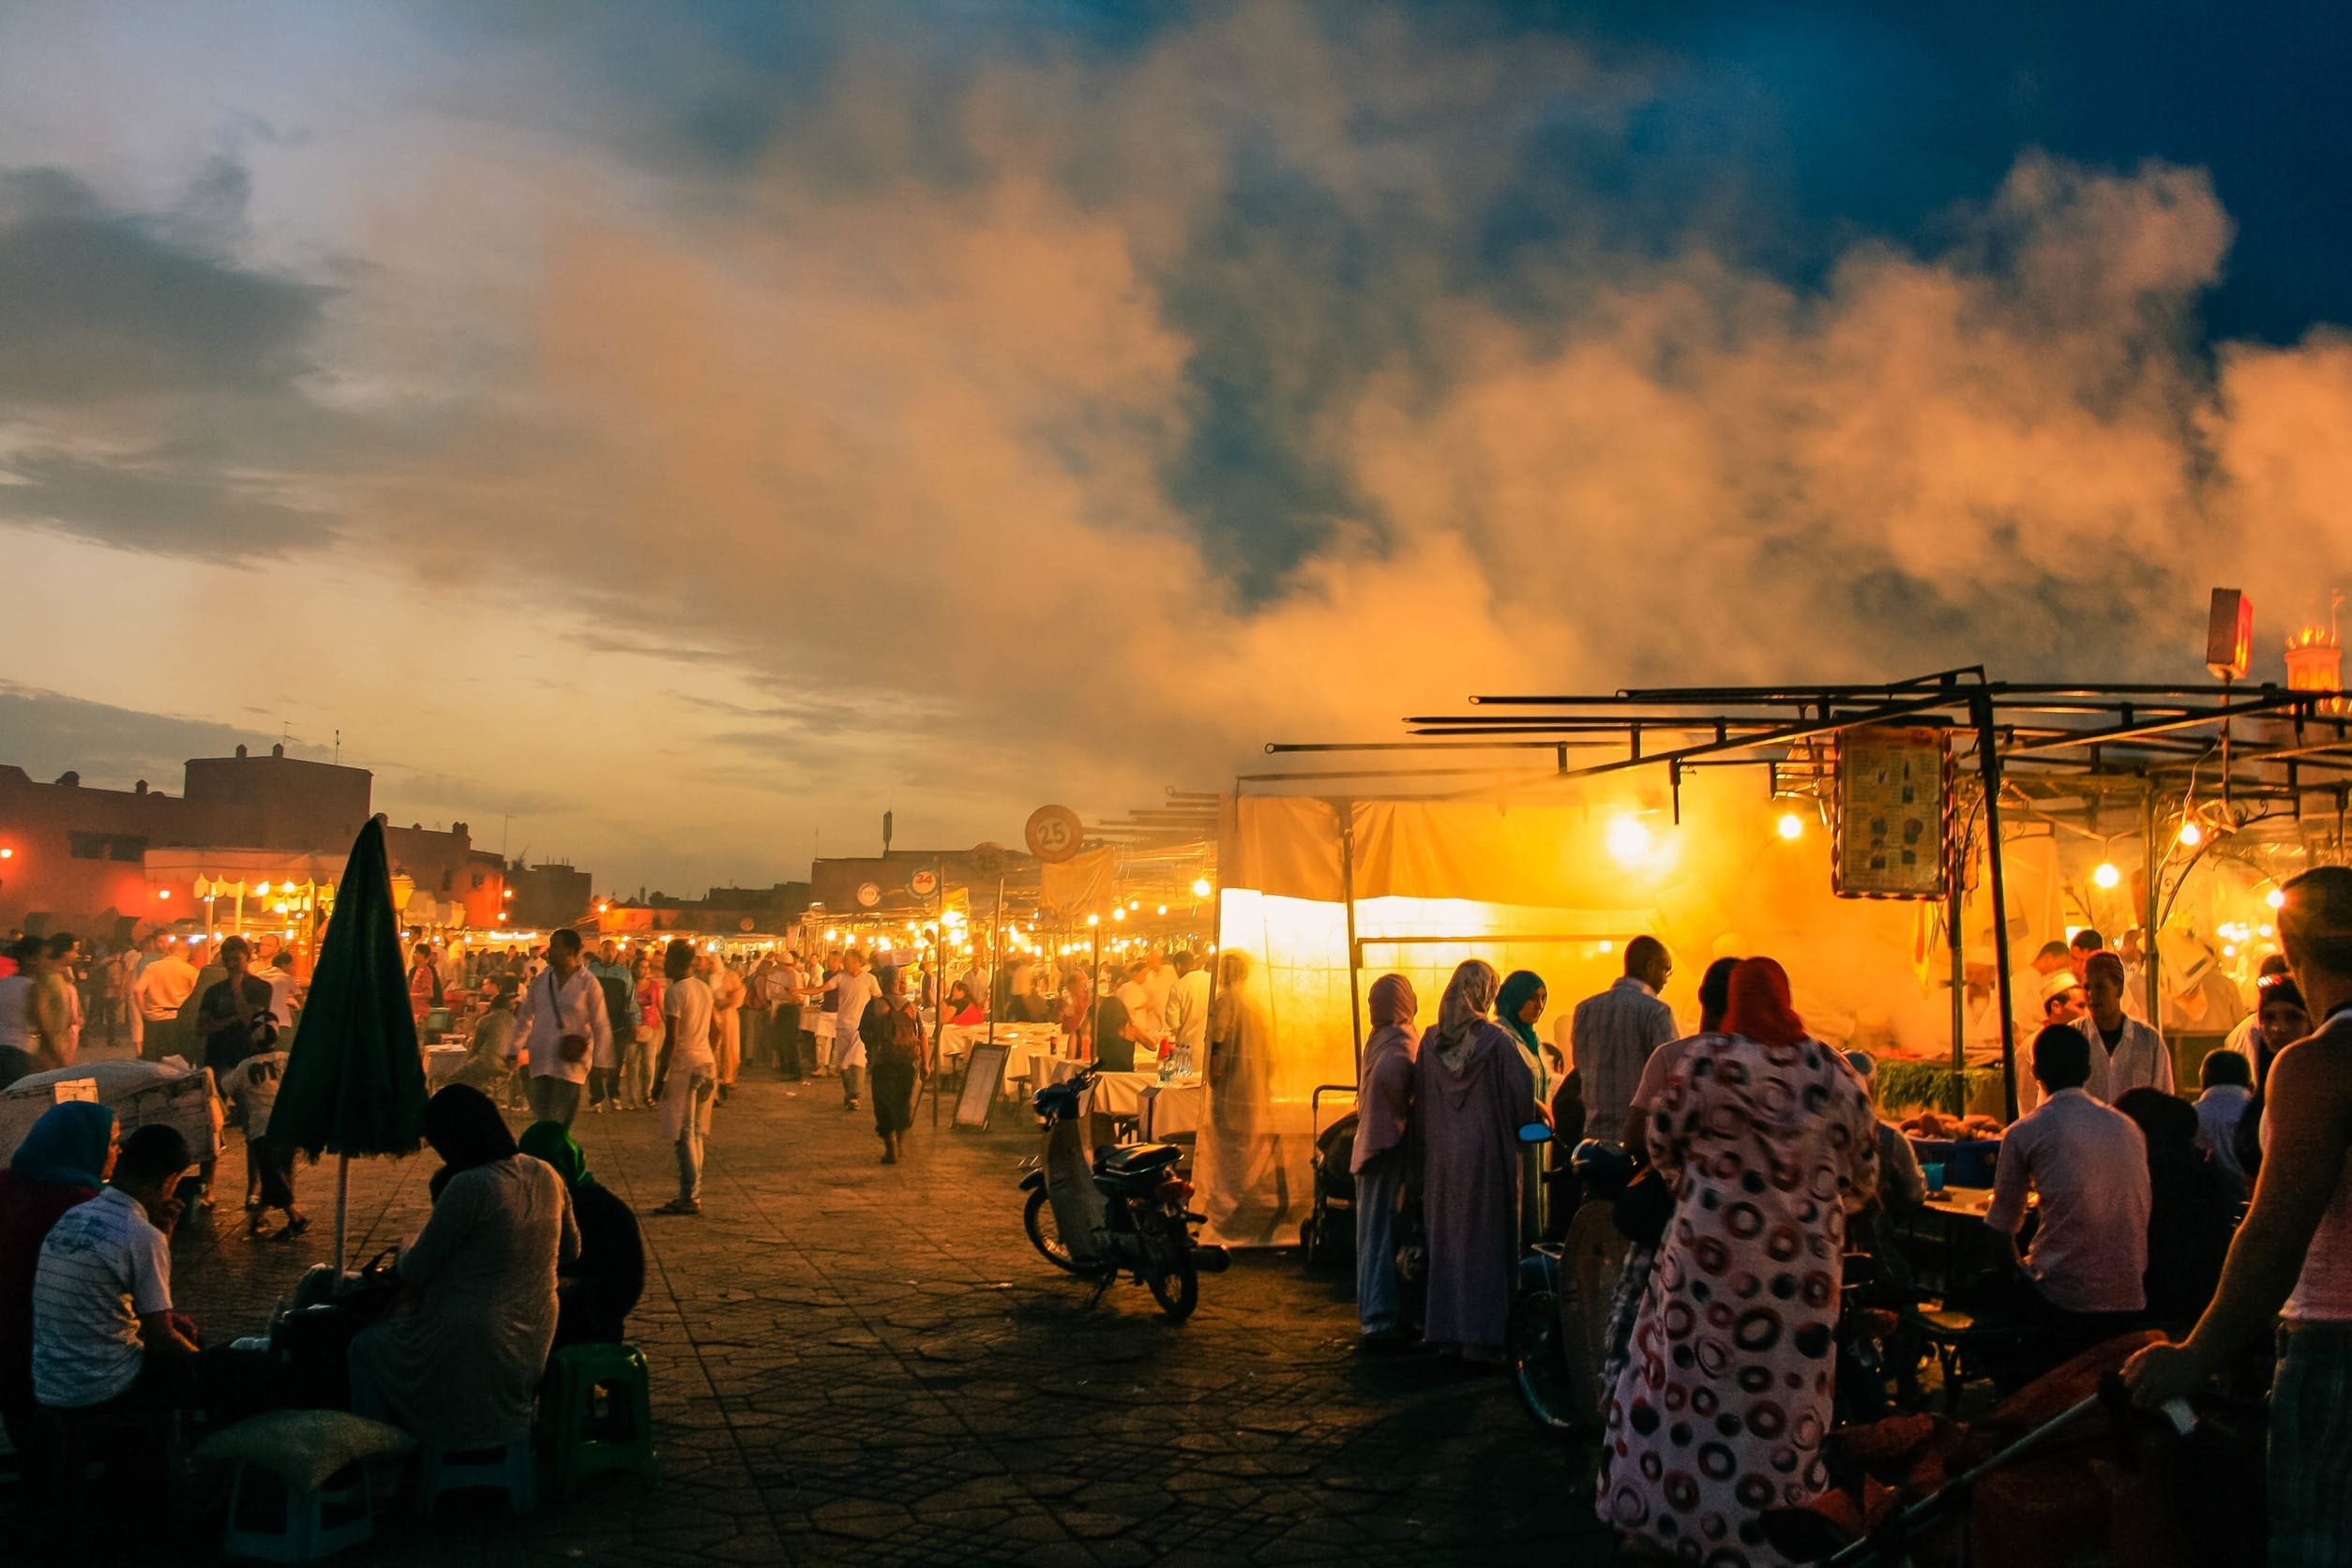 People In Night Market